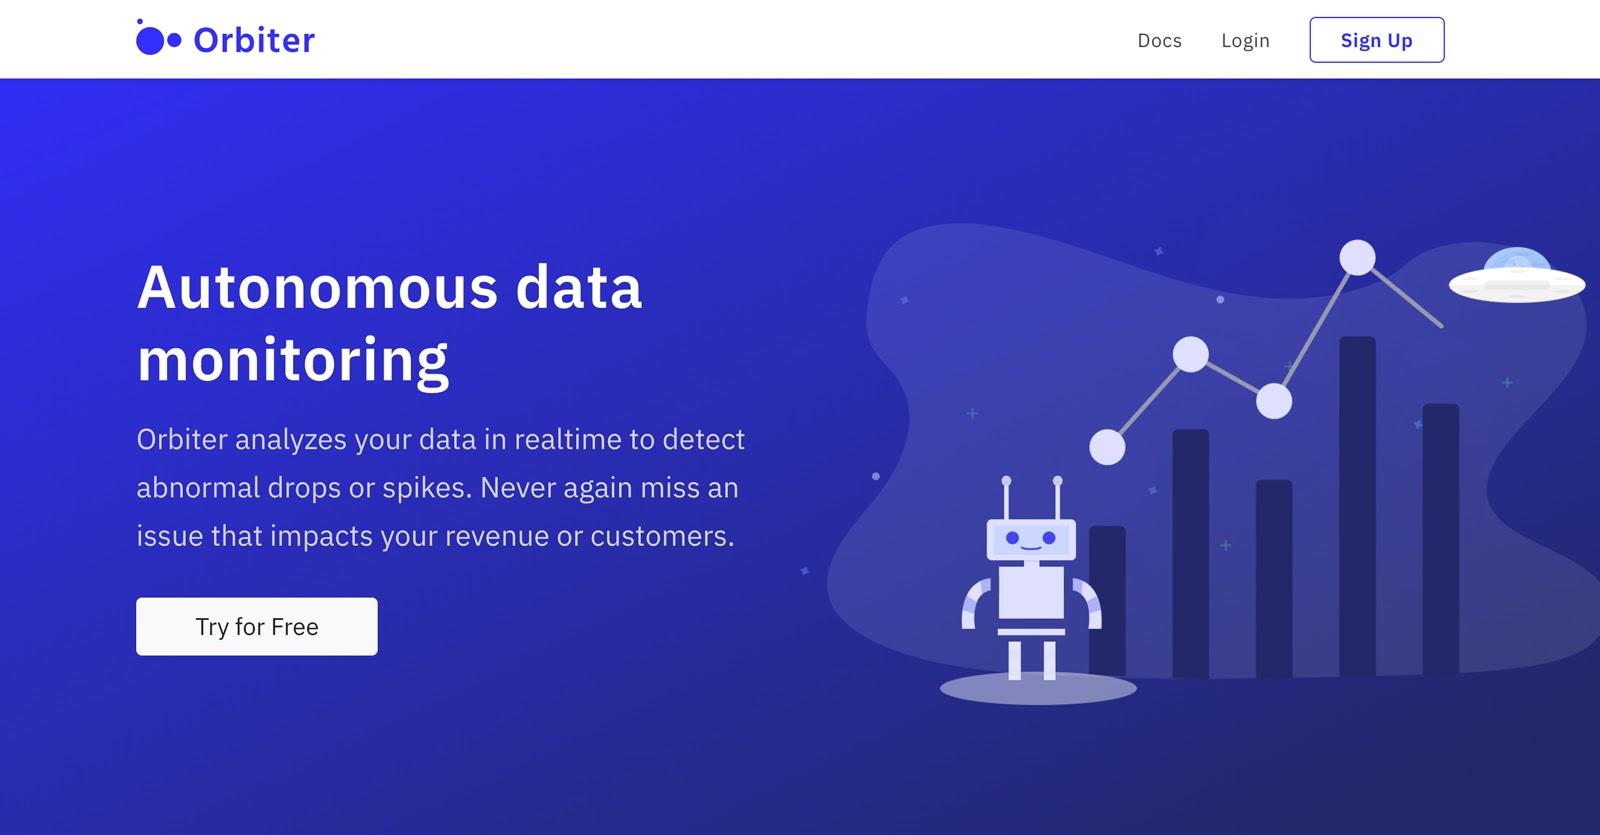 orbiter home page